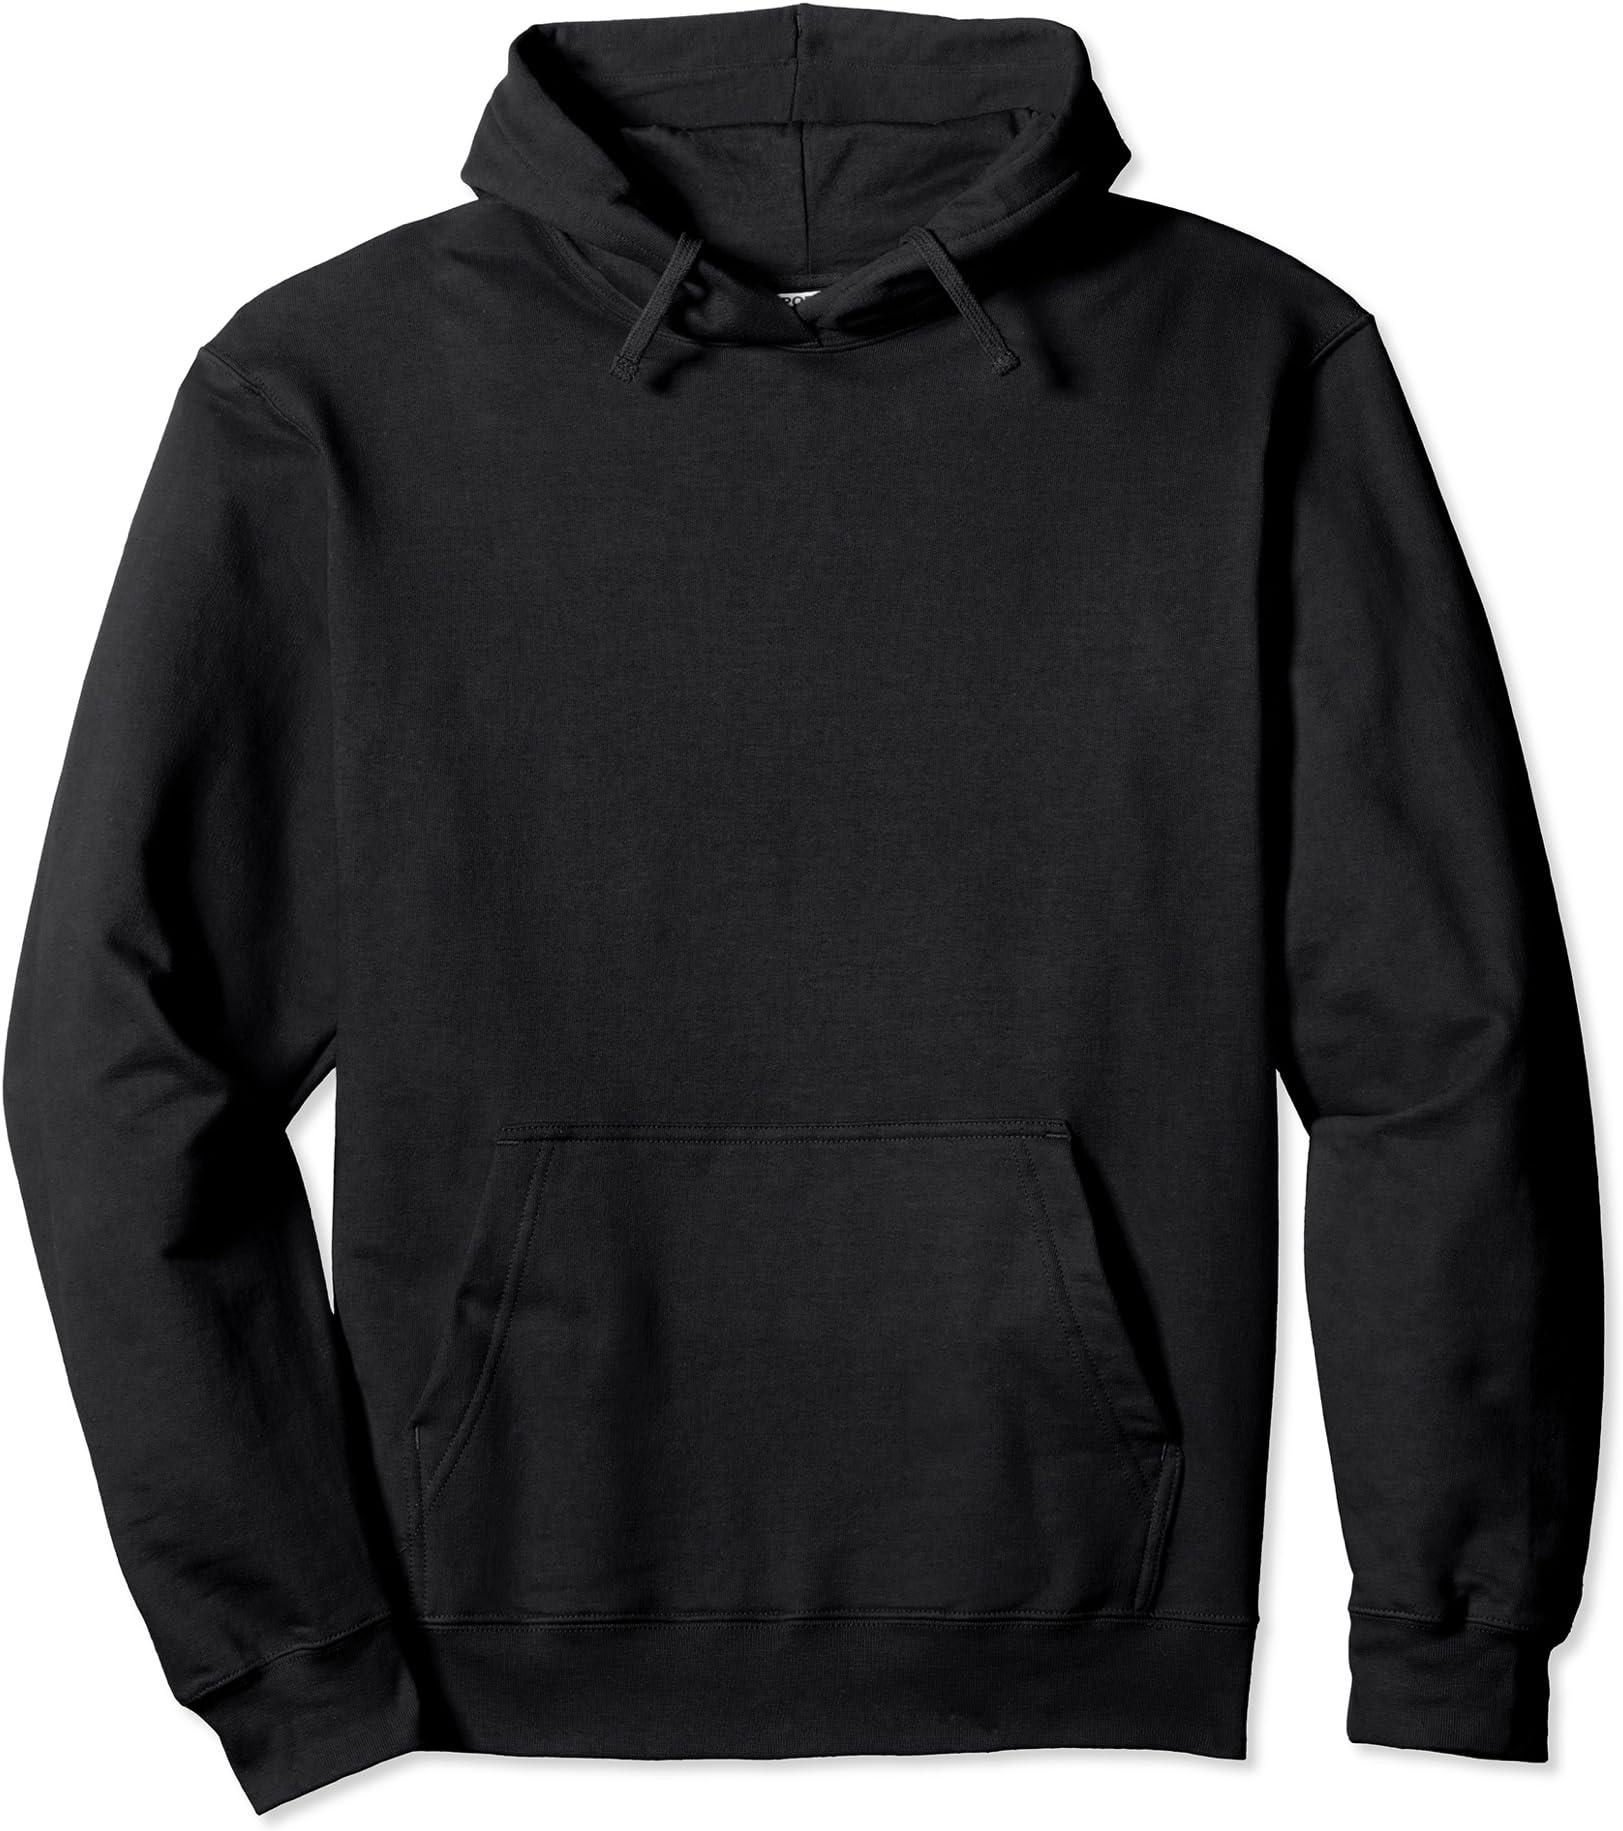 Mens U.S Customs and Border Protection Hooded Fleece Sweatshirt